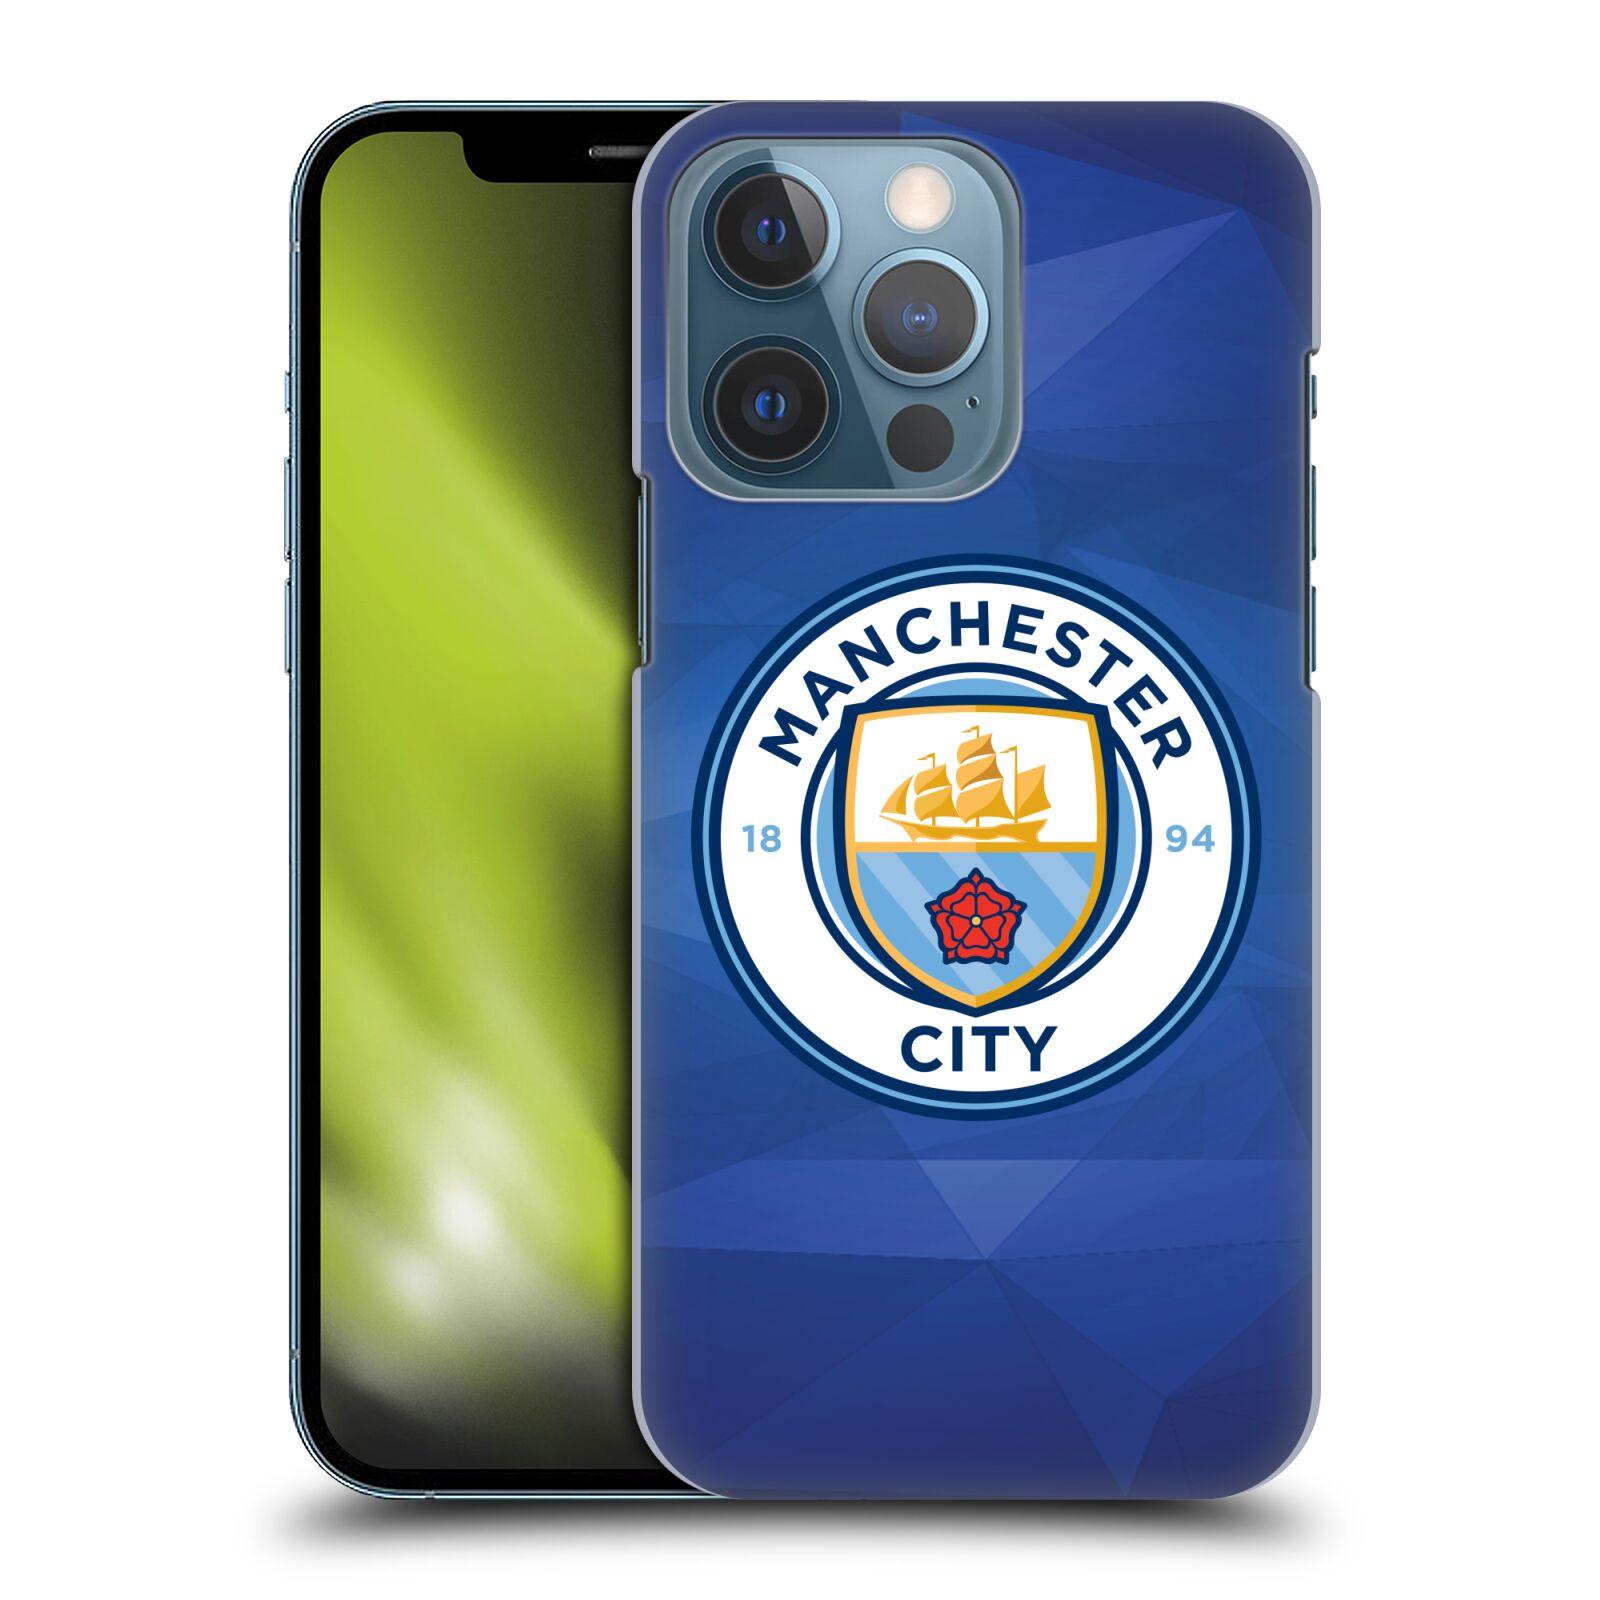 Plastové pouzdro na mobil Apple iPhone 13 Pro - Head Case - Manchester City FC - Modré nové logo